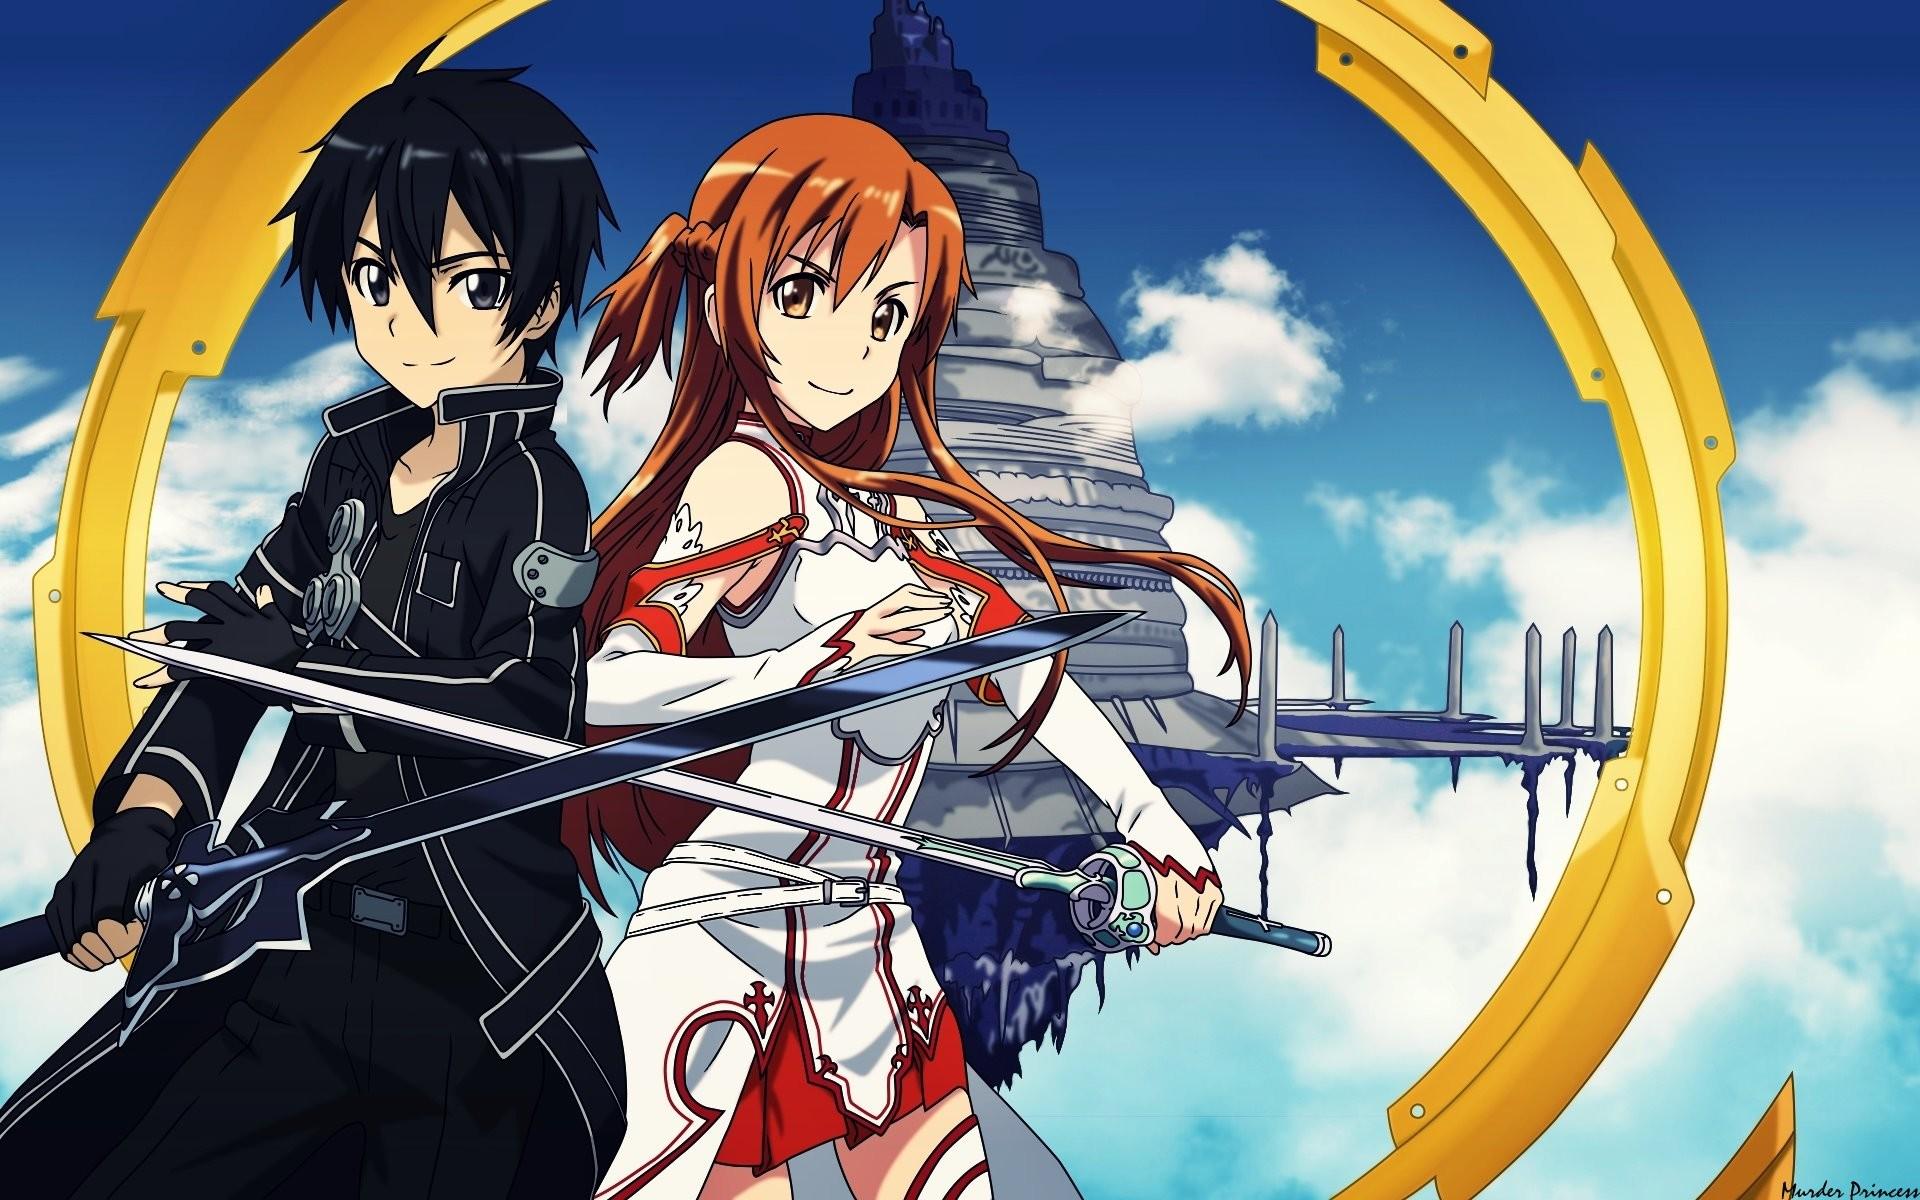 Wallpapers de Diferentes Animes (HD) – Taringa!